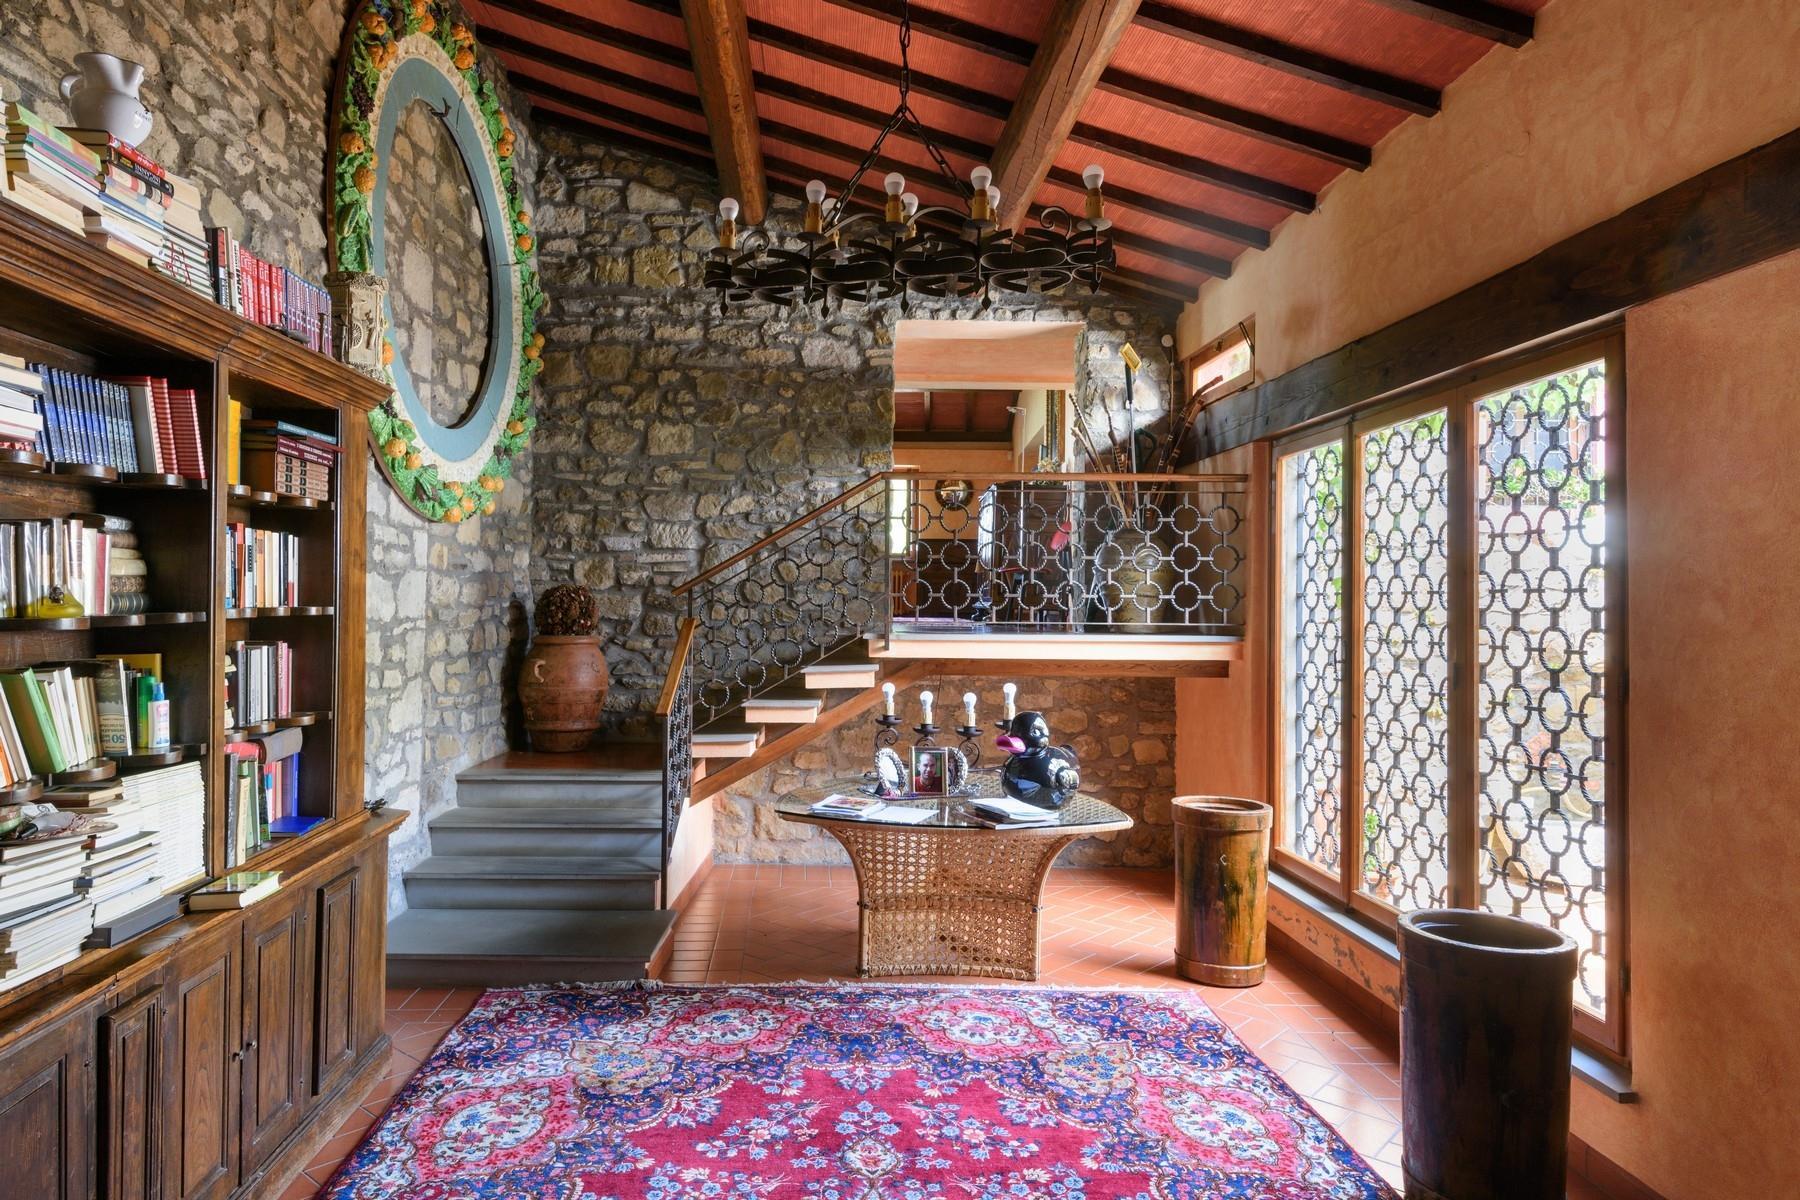 Wichtige Weinanbaubetriebe im Chianti-Gebiet - 4